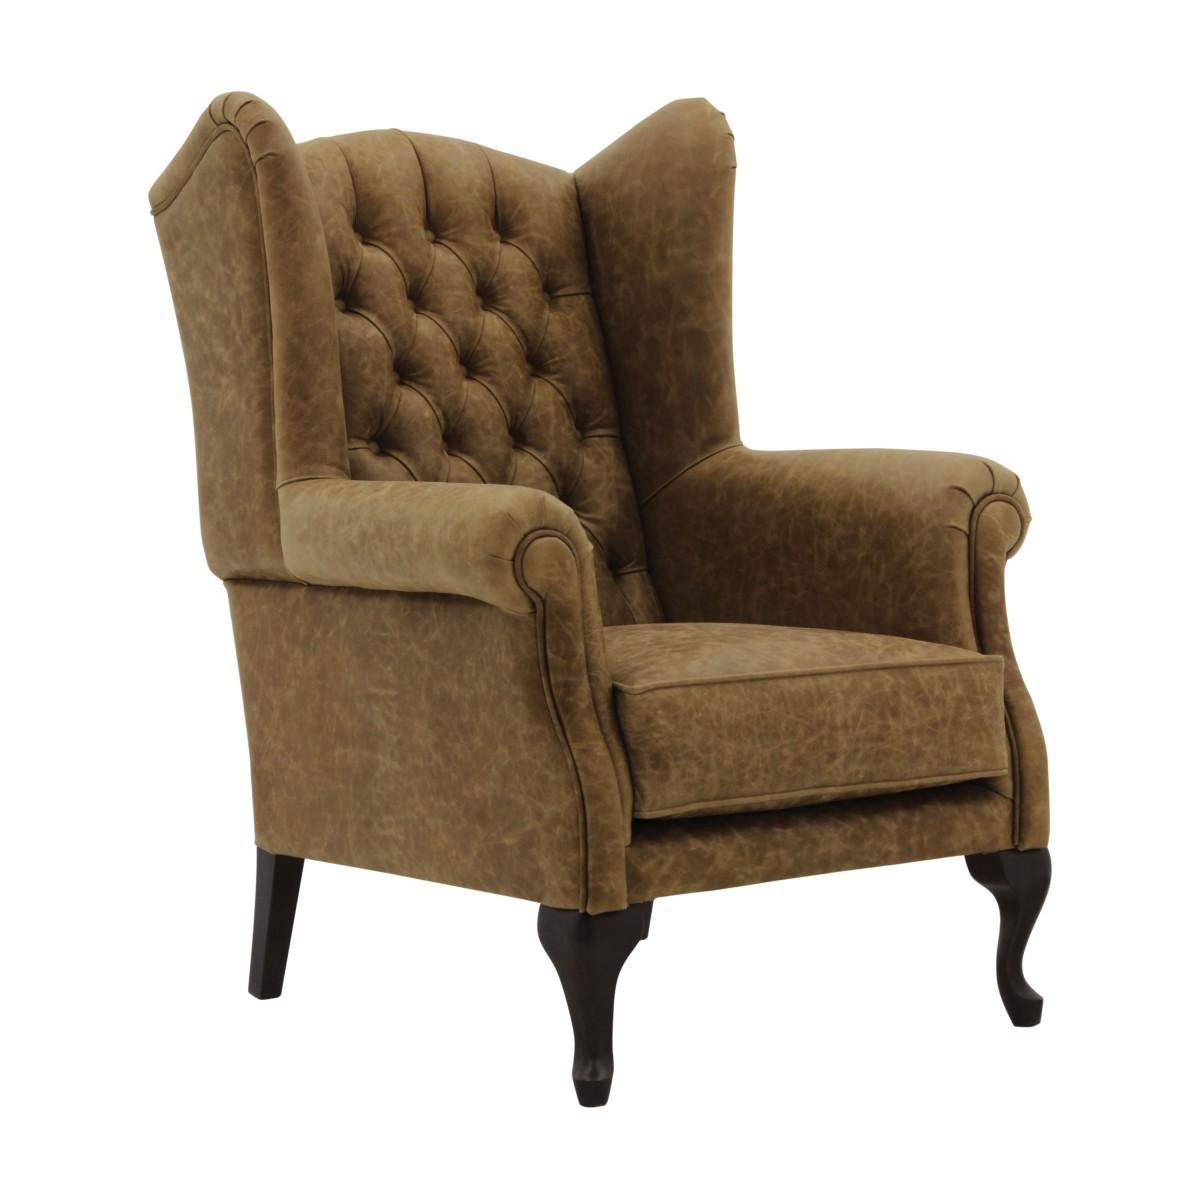 classic armchair old england 9831